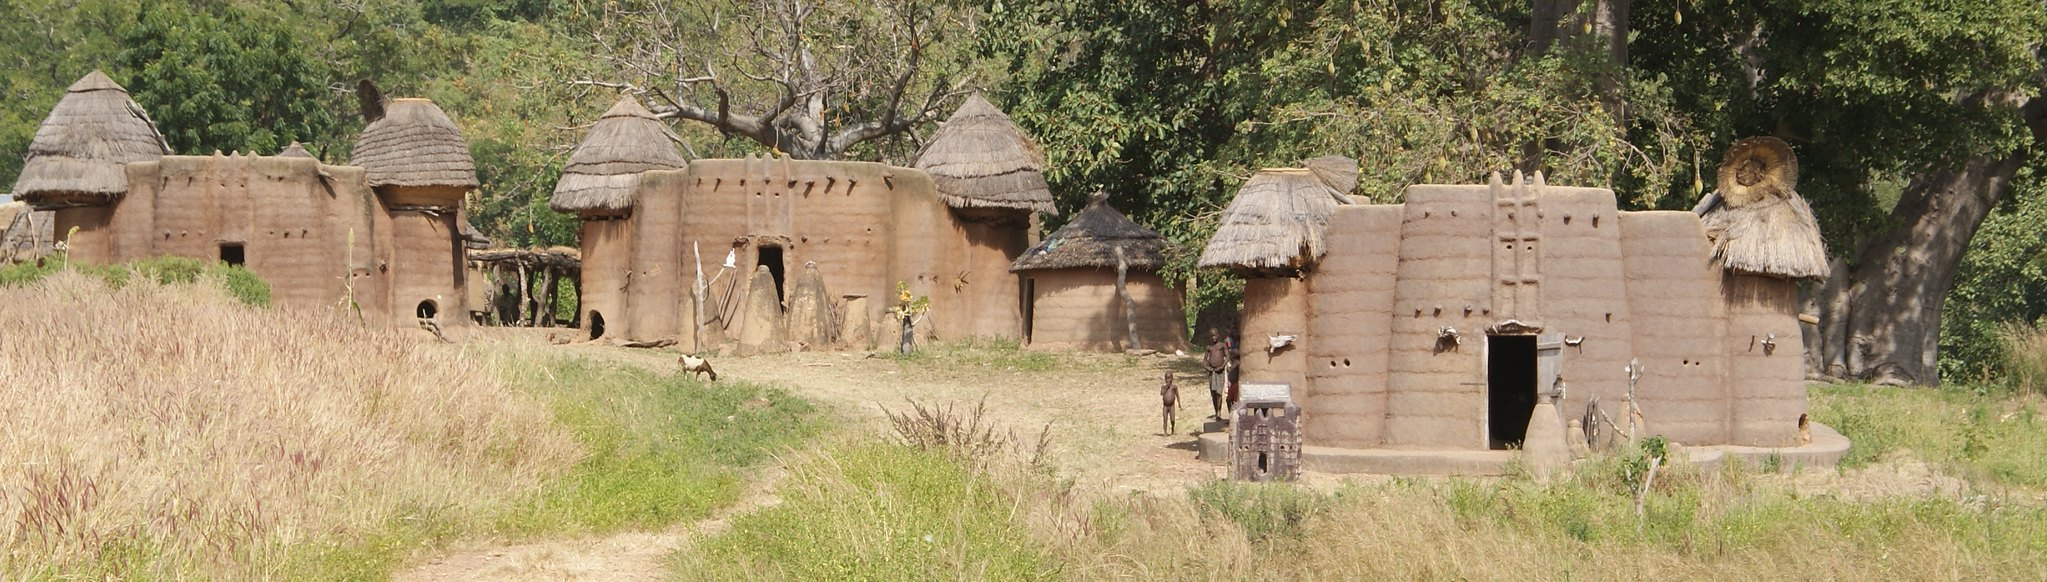 GHANA, TOGO, BENIN: Festivals and traditions